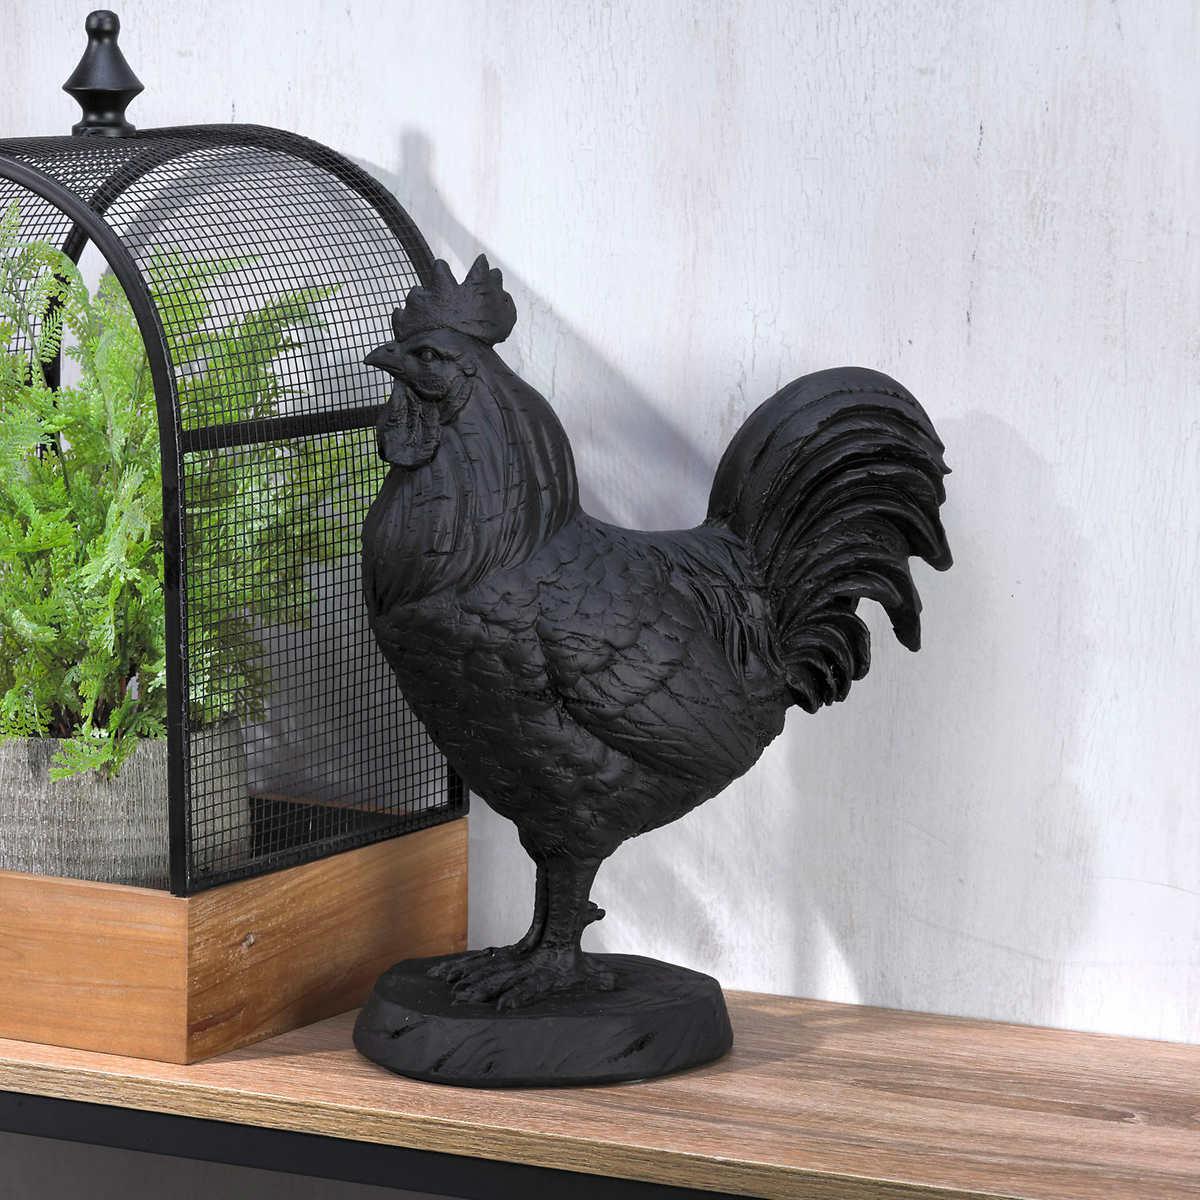 Elements Decorative Rooster Sculpture